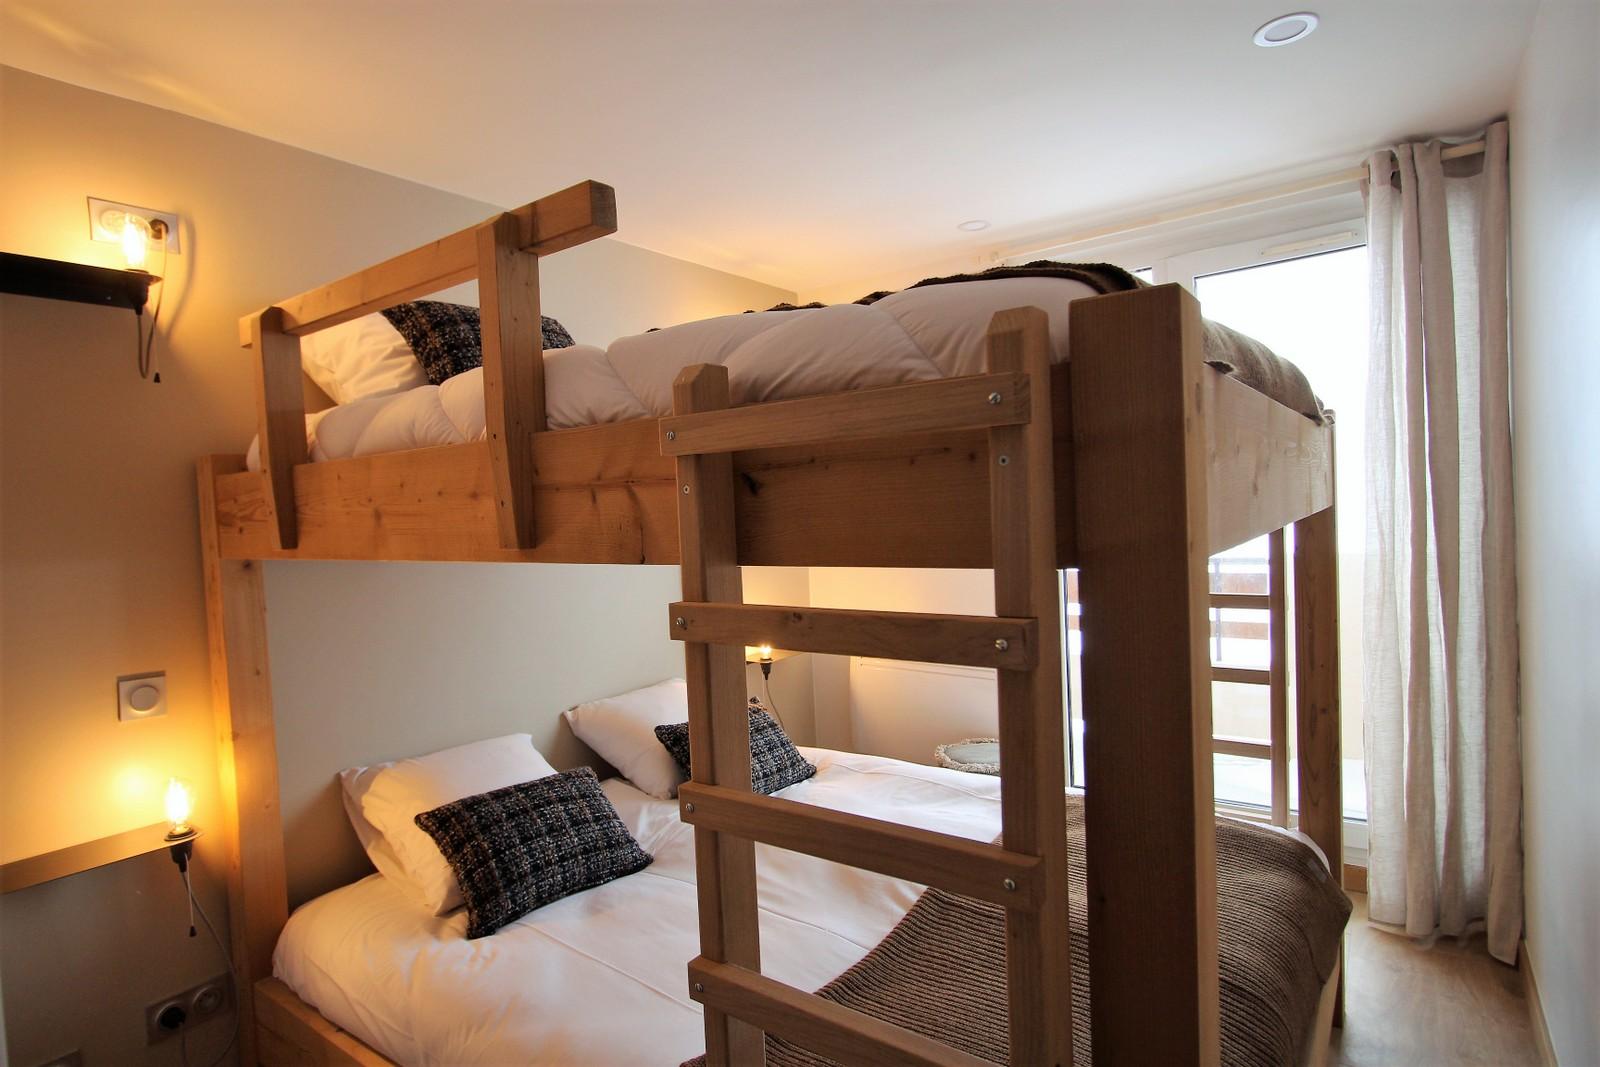 dortoir 4 couchages façon refuge 2 alpes